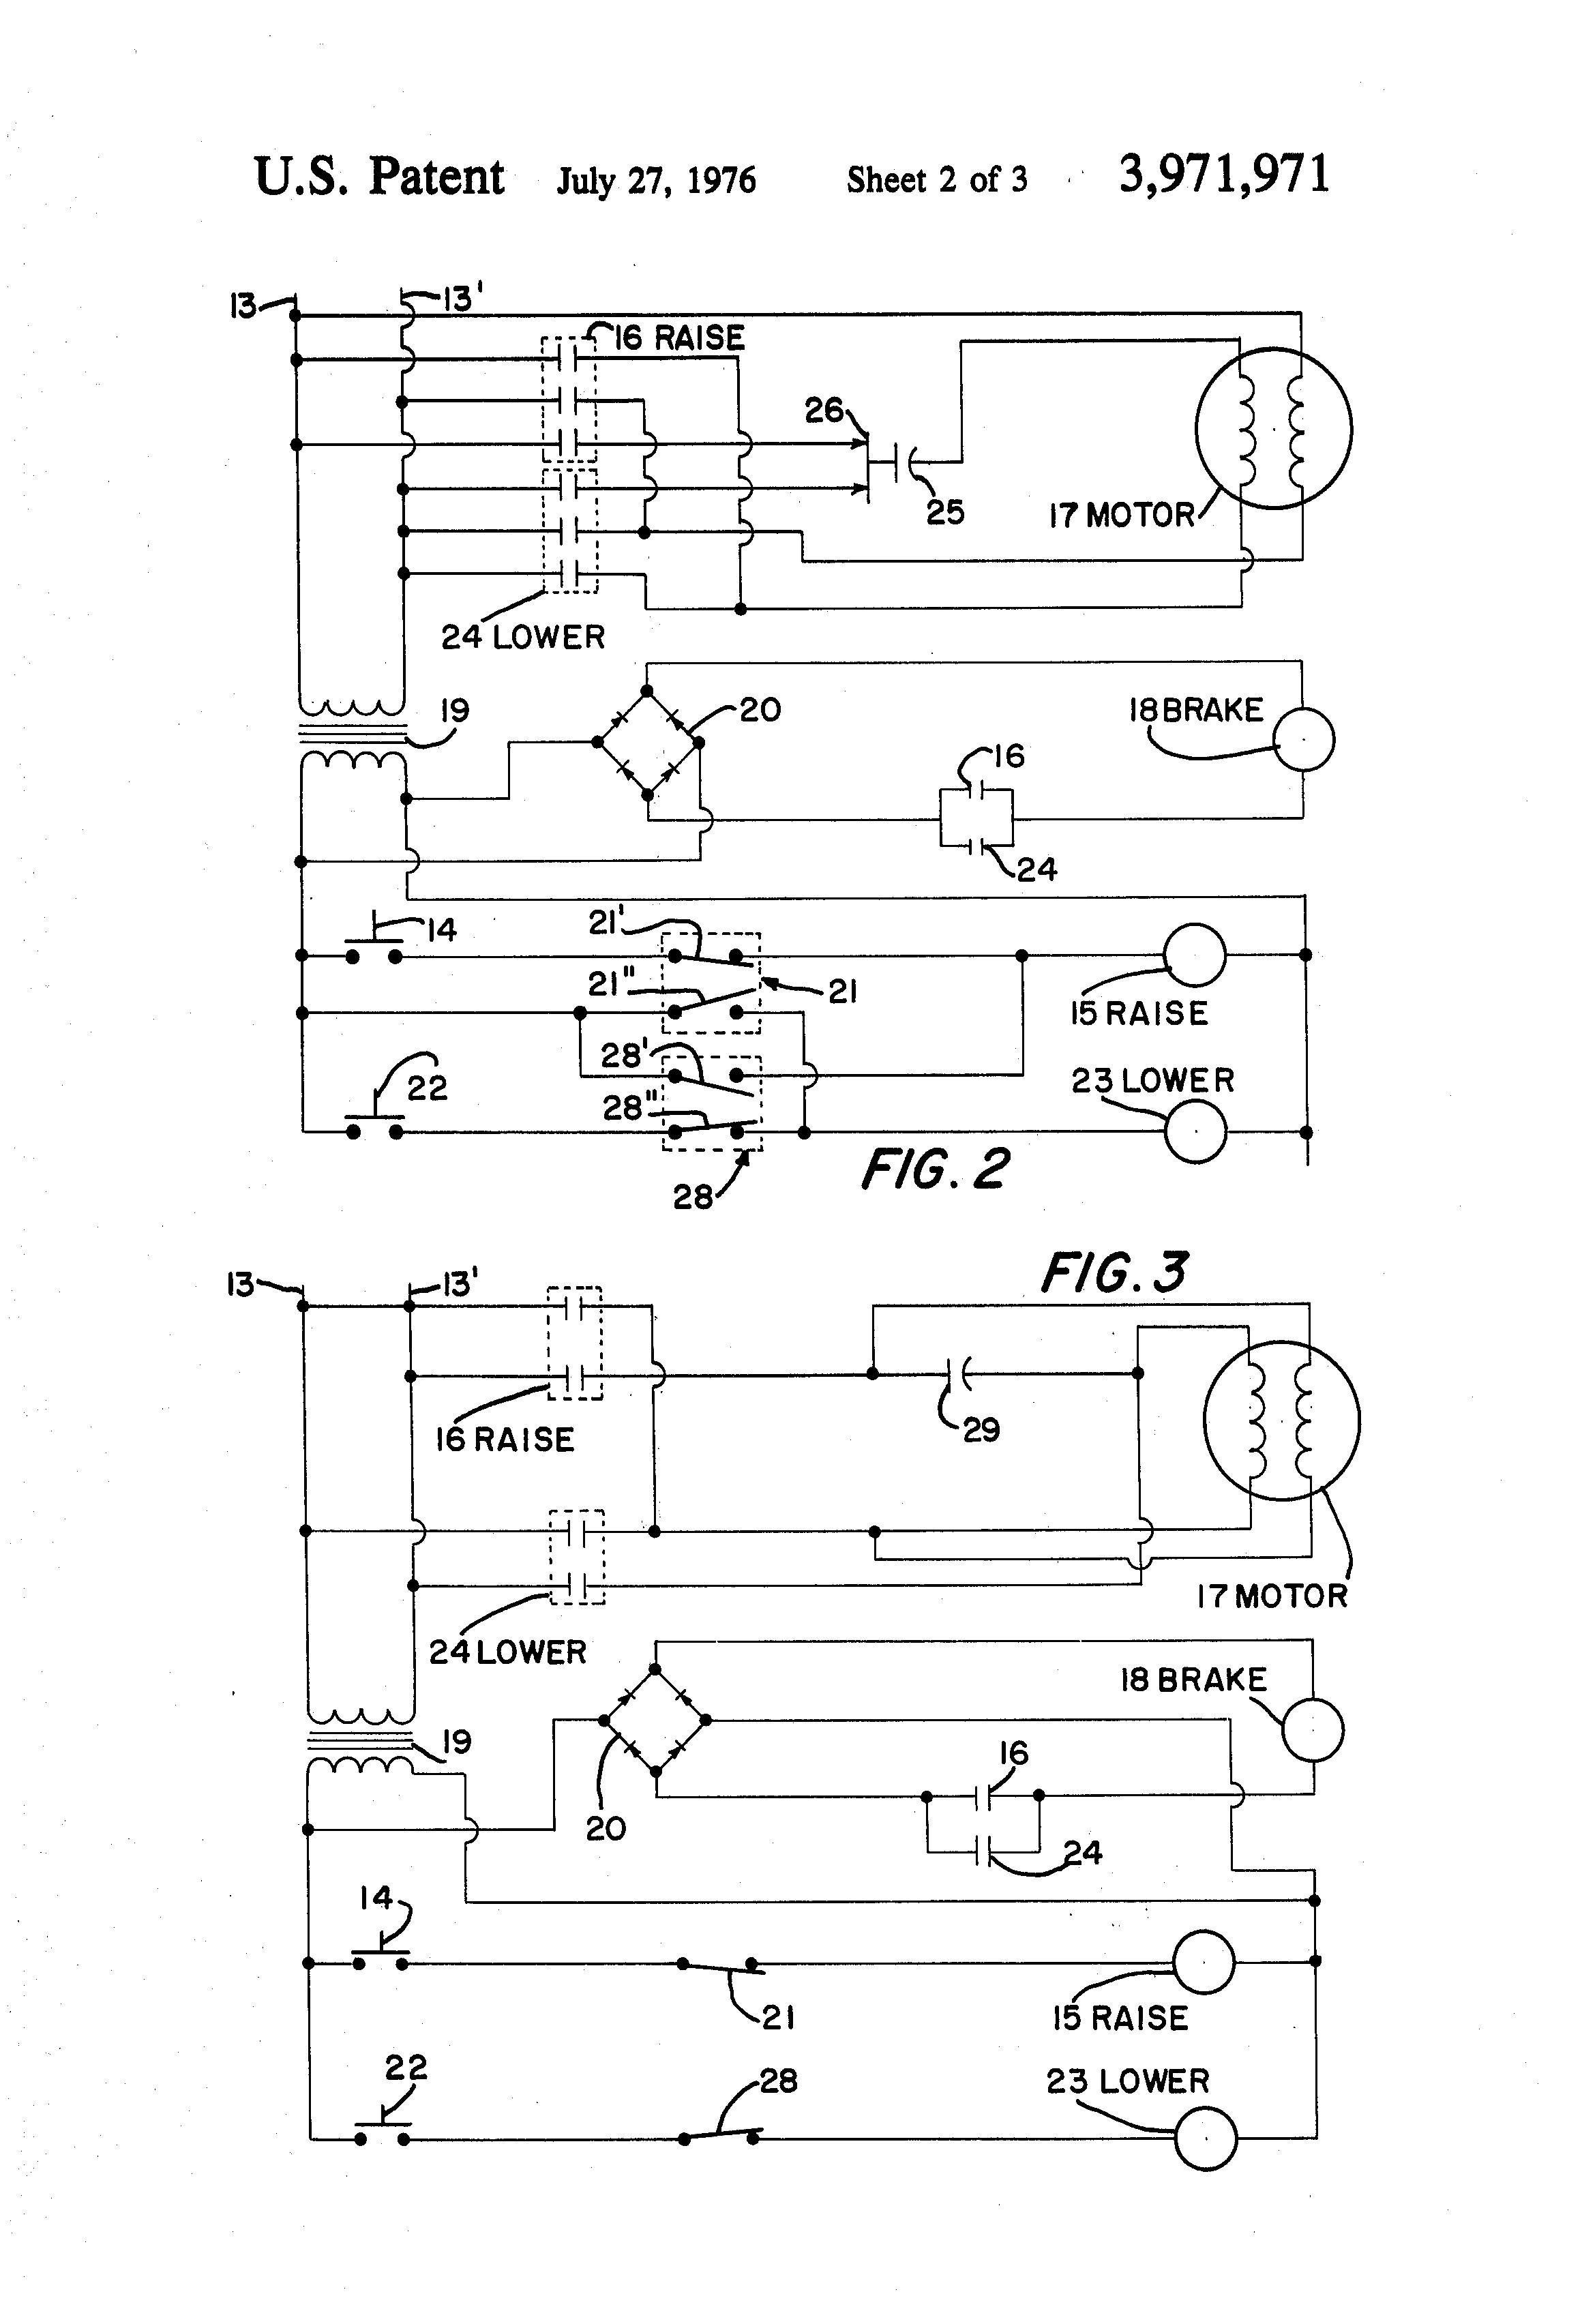 coffing wiring diagram wiring diagramcoffing wiring diagram 480 wiring diagramscoffing hoist wiring diagram with trolly u5d rakanzleiberlin de \\\\